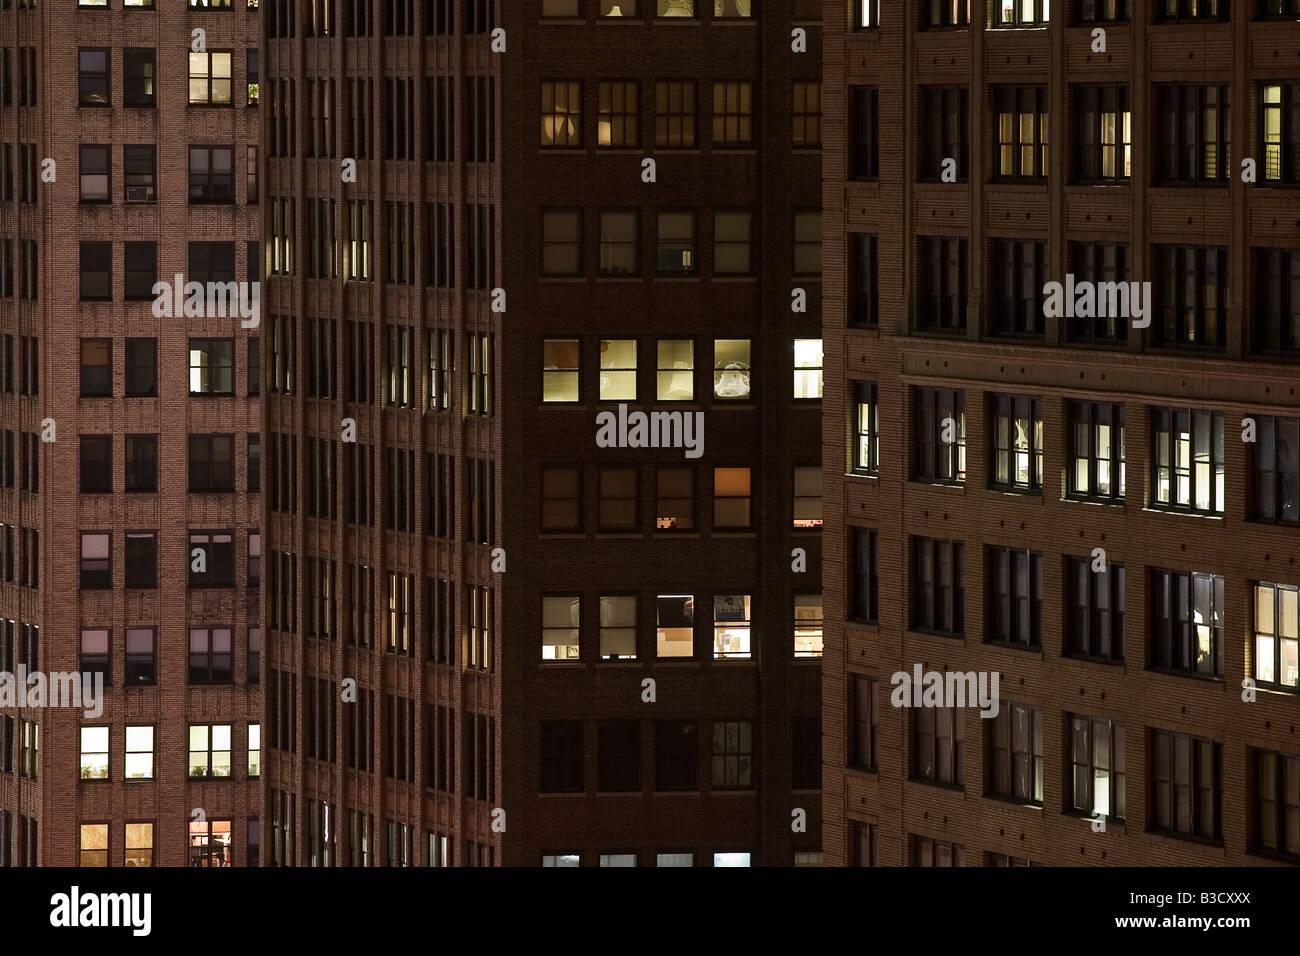 Building, close-up Stock Photo